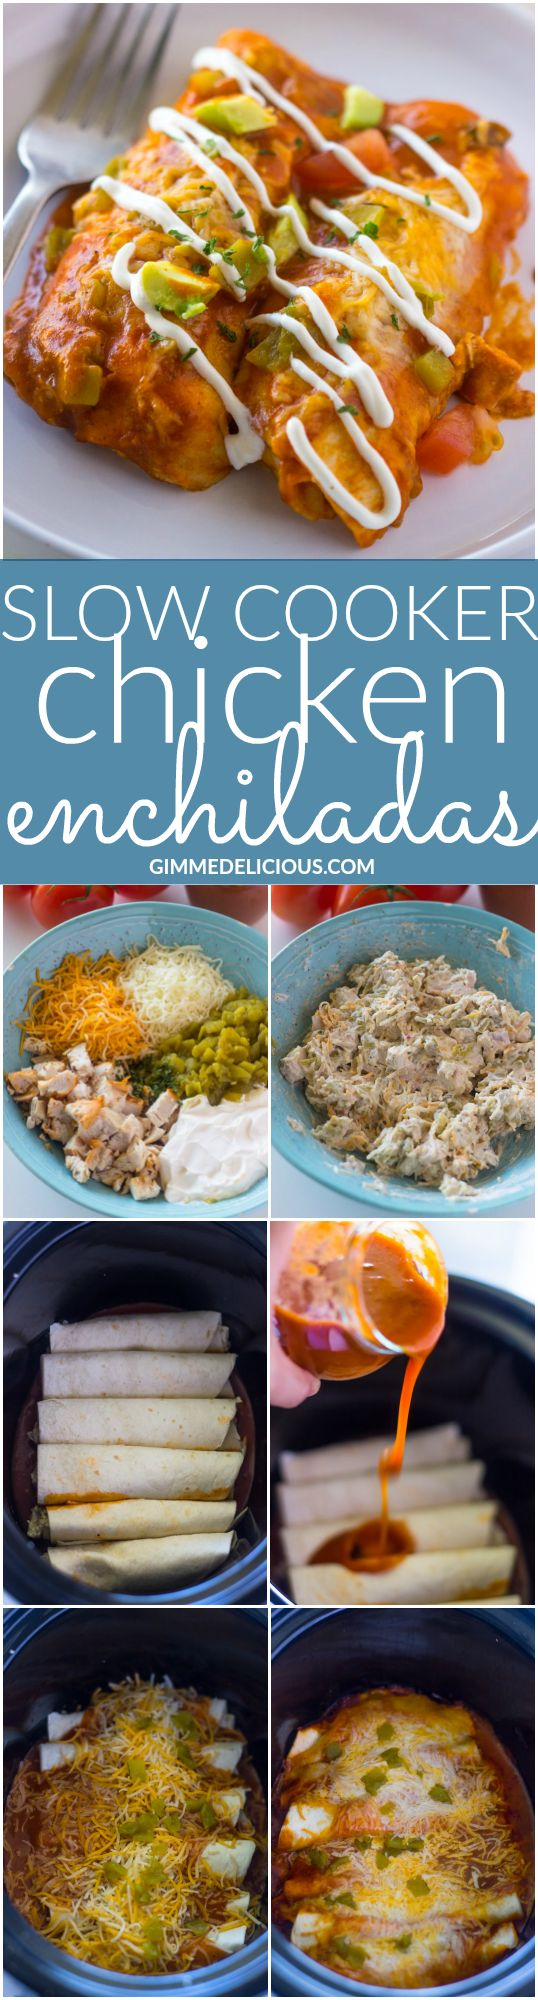 Slow Cooker Chicken Enchiladas | Gimme Delicious